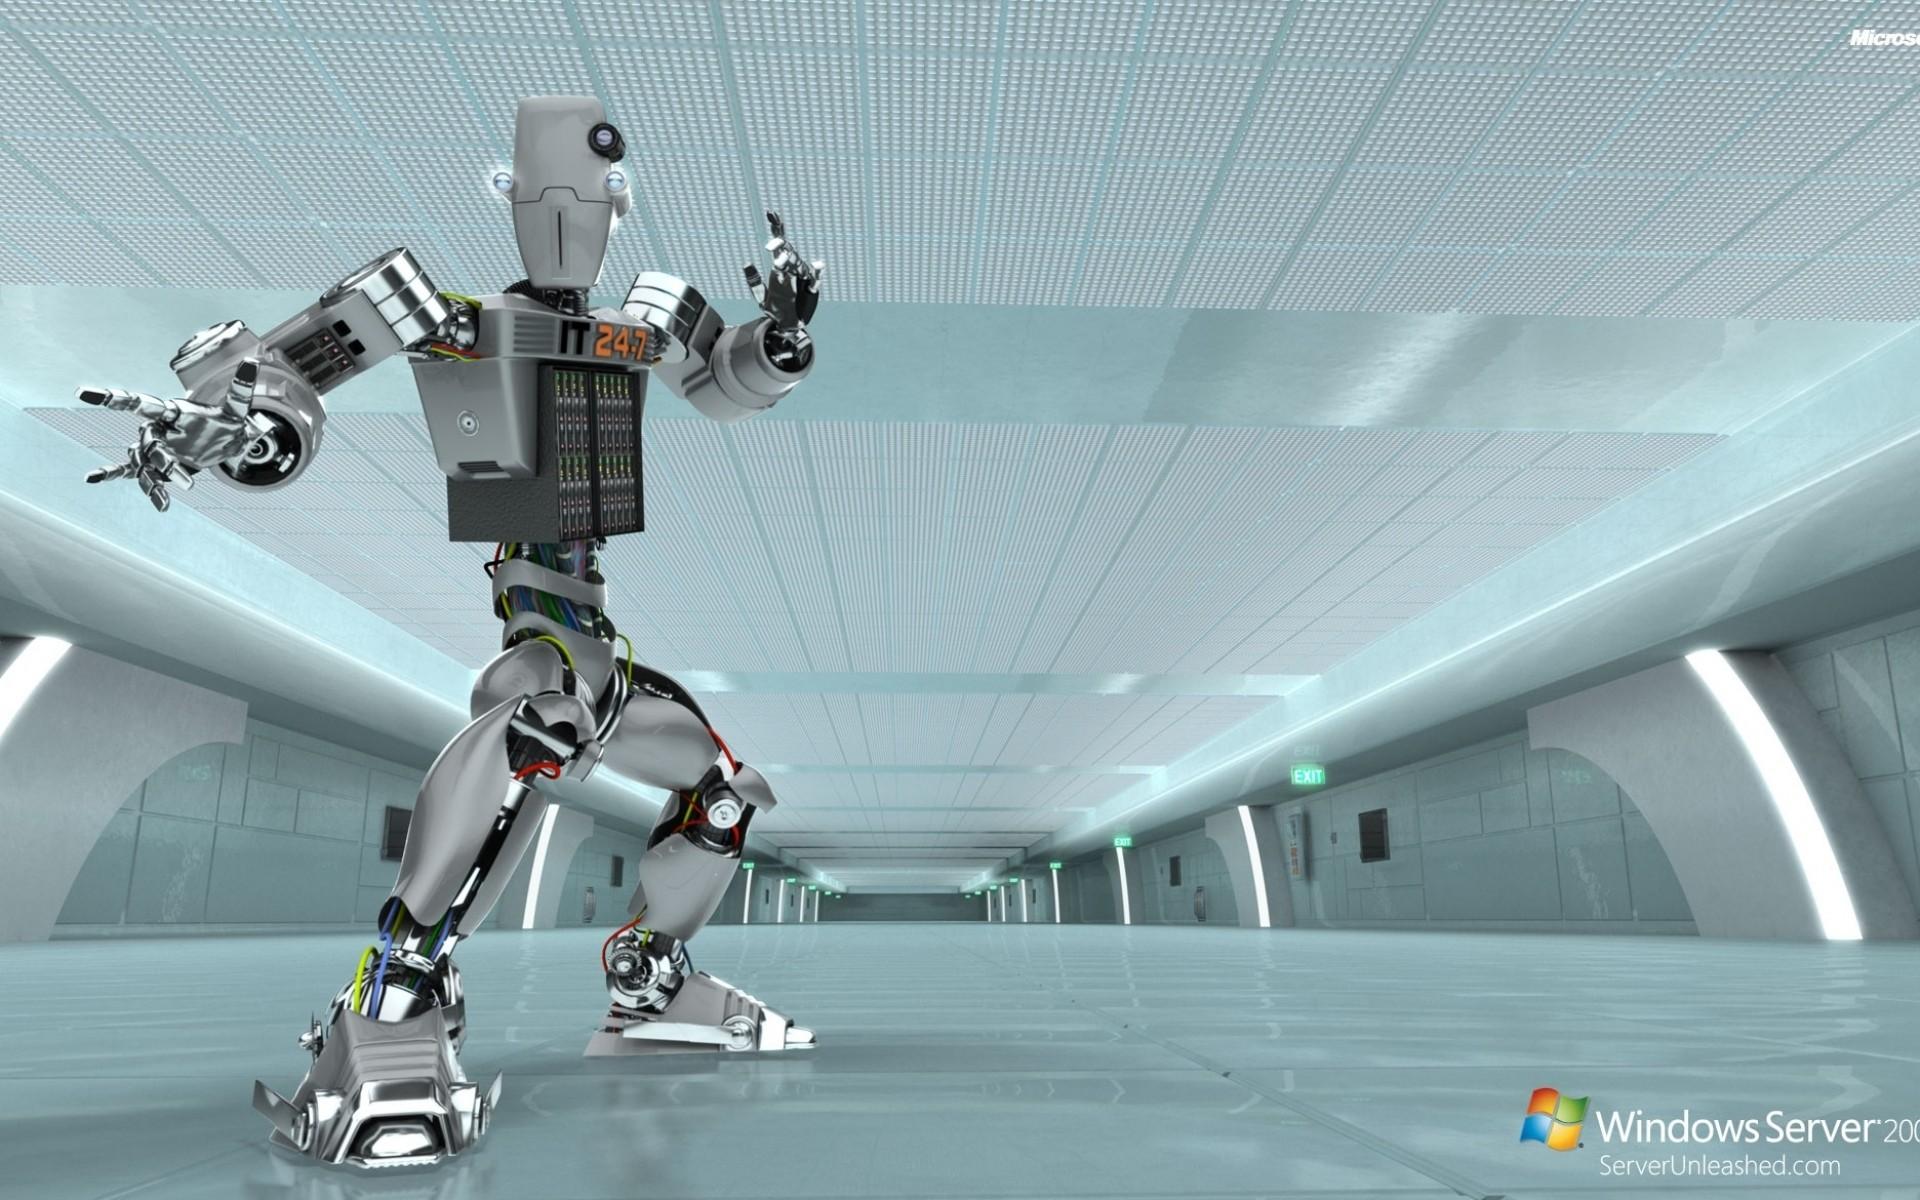 Res: 1920x1200, Windows Server 2008 Unleashed IT 24-7 Robot Desktop Background Wallpaper  Free Download